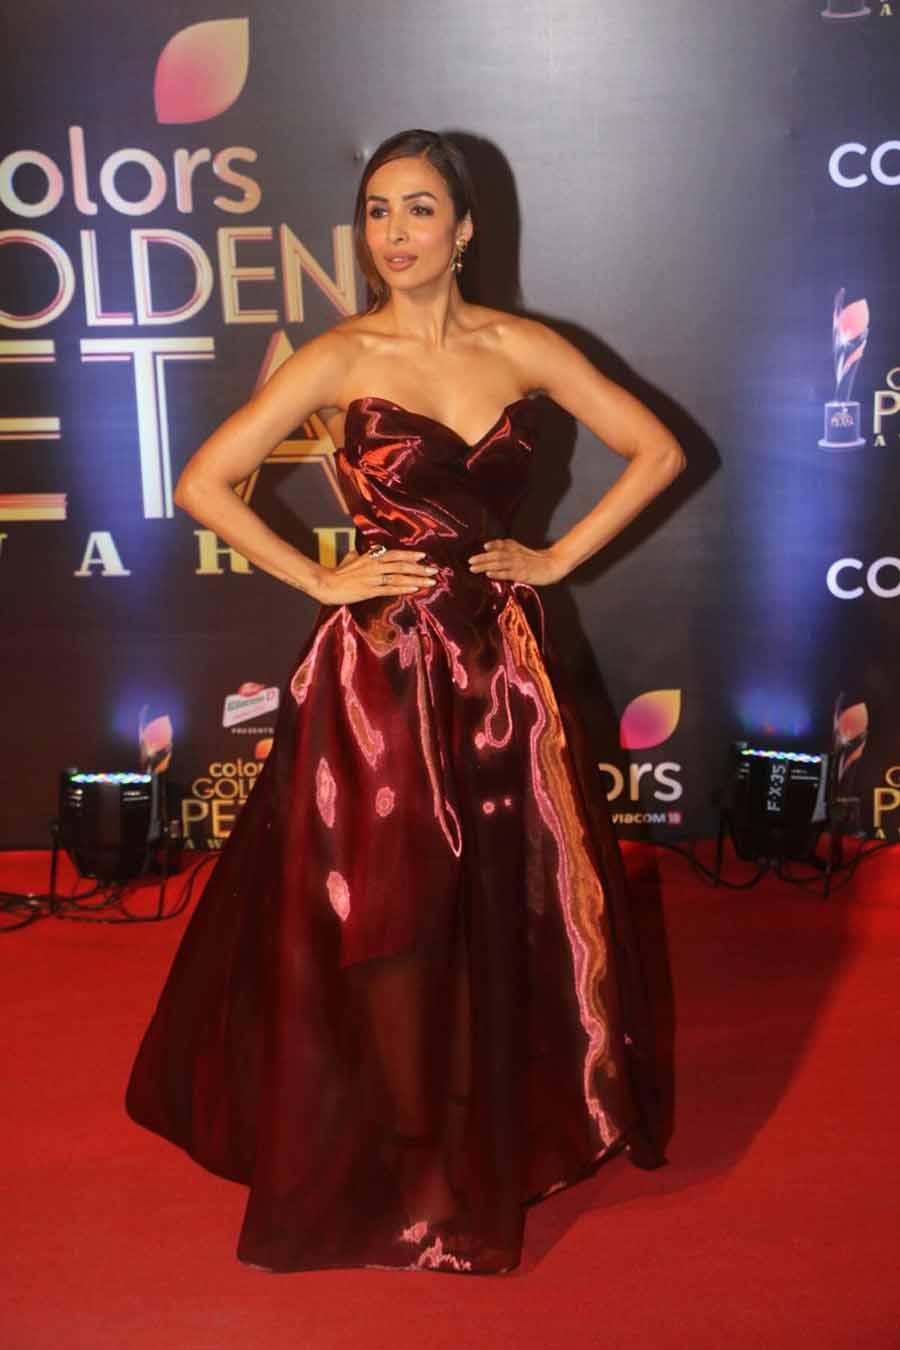 Malaika Arora Khan looking beautiful during the award show